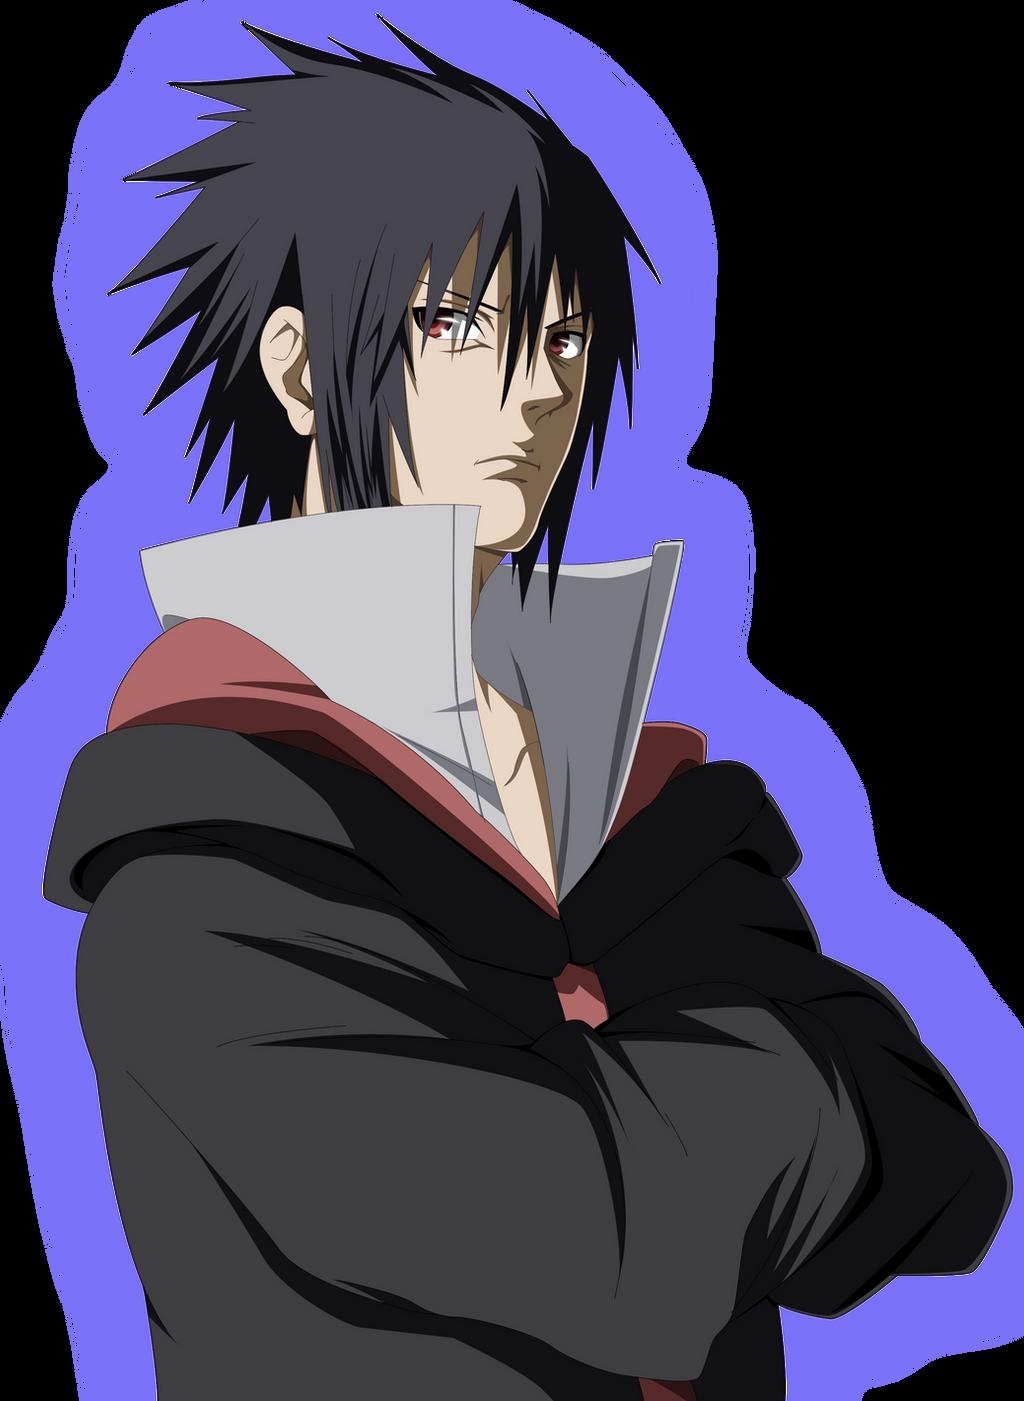 Arts sasuke